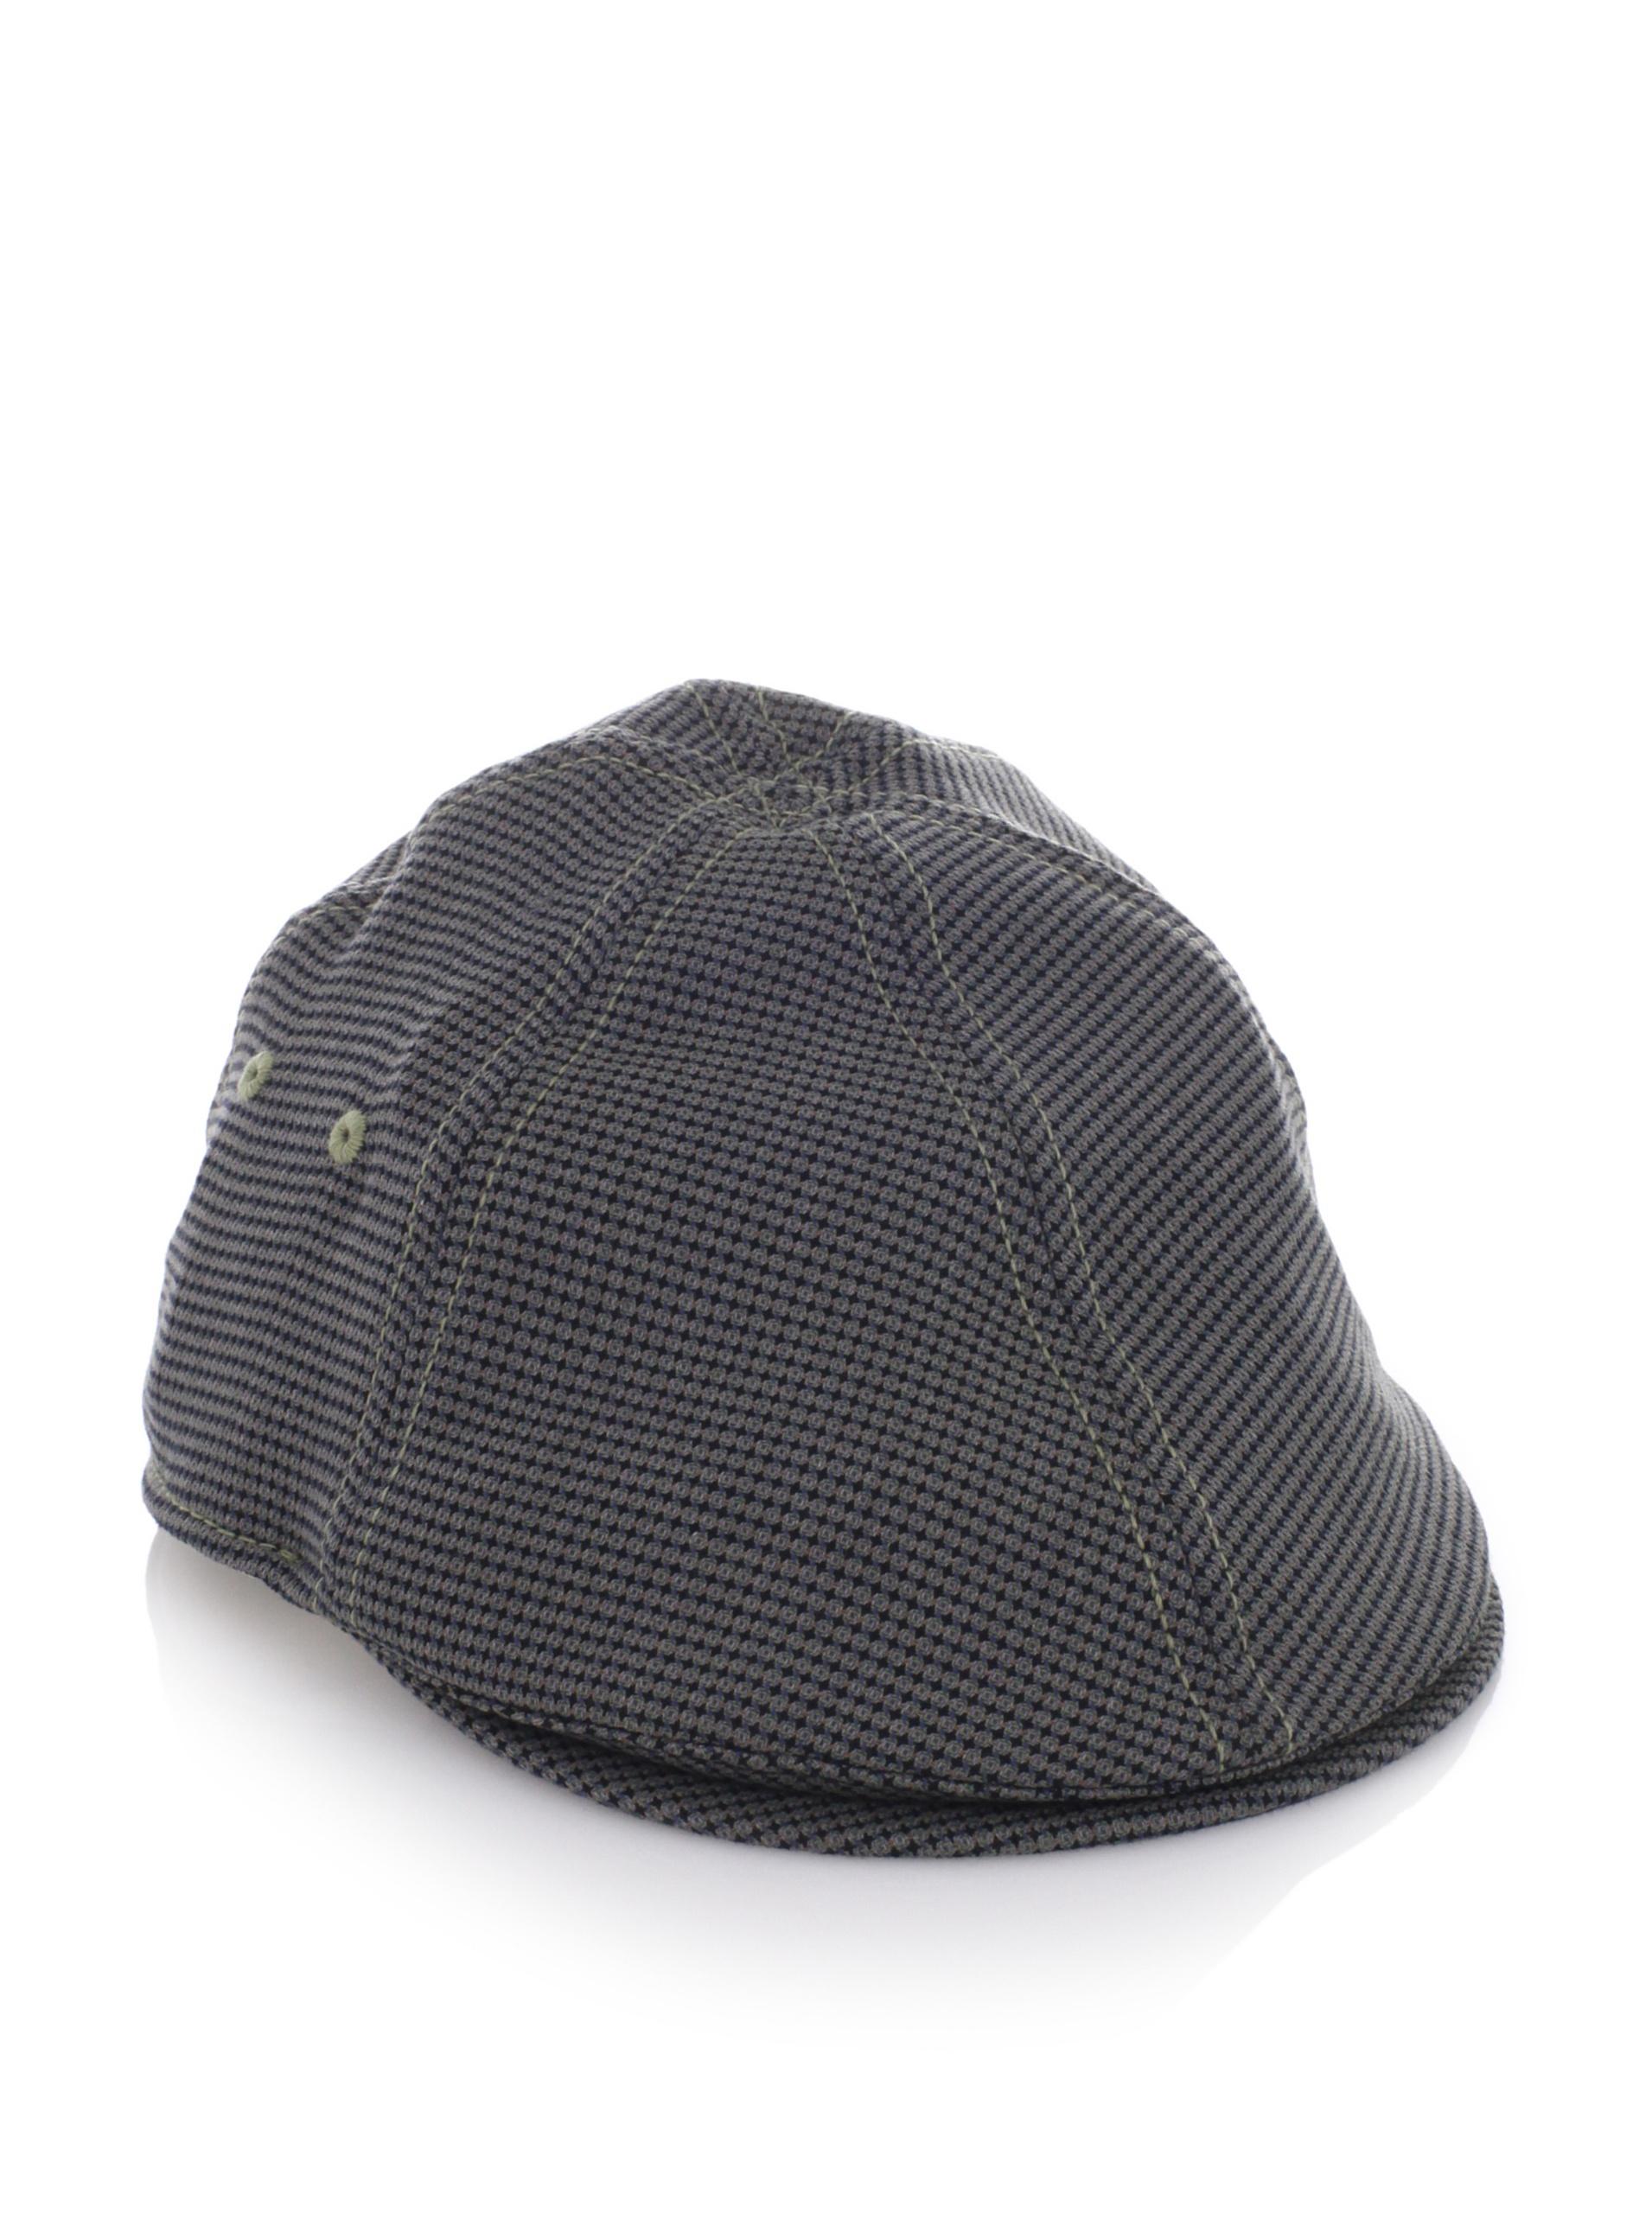 Goorin Brothers Men's Levin Ivy Cap (Grey)